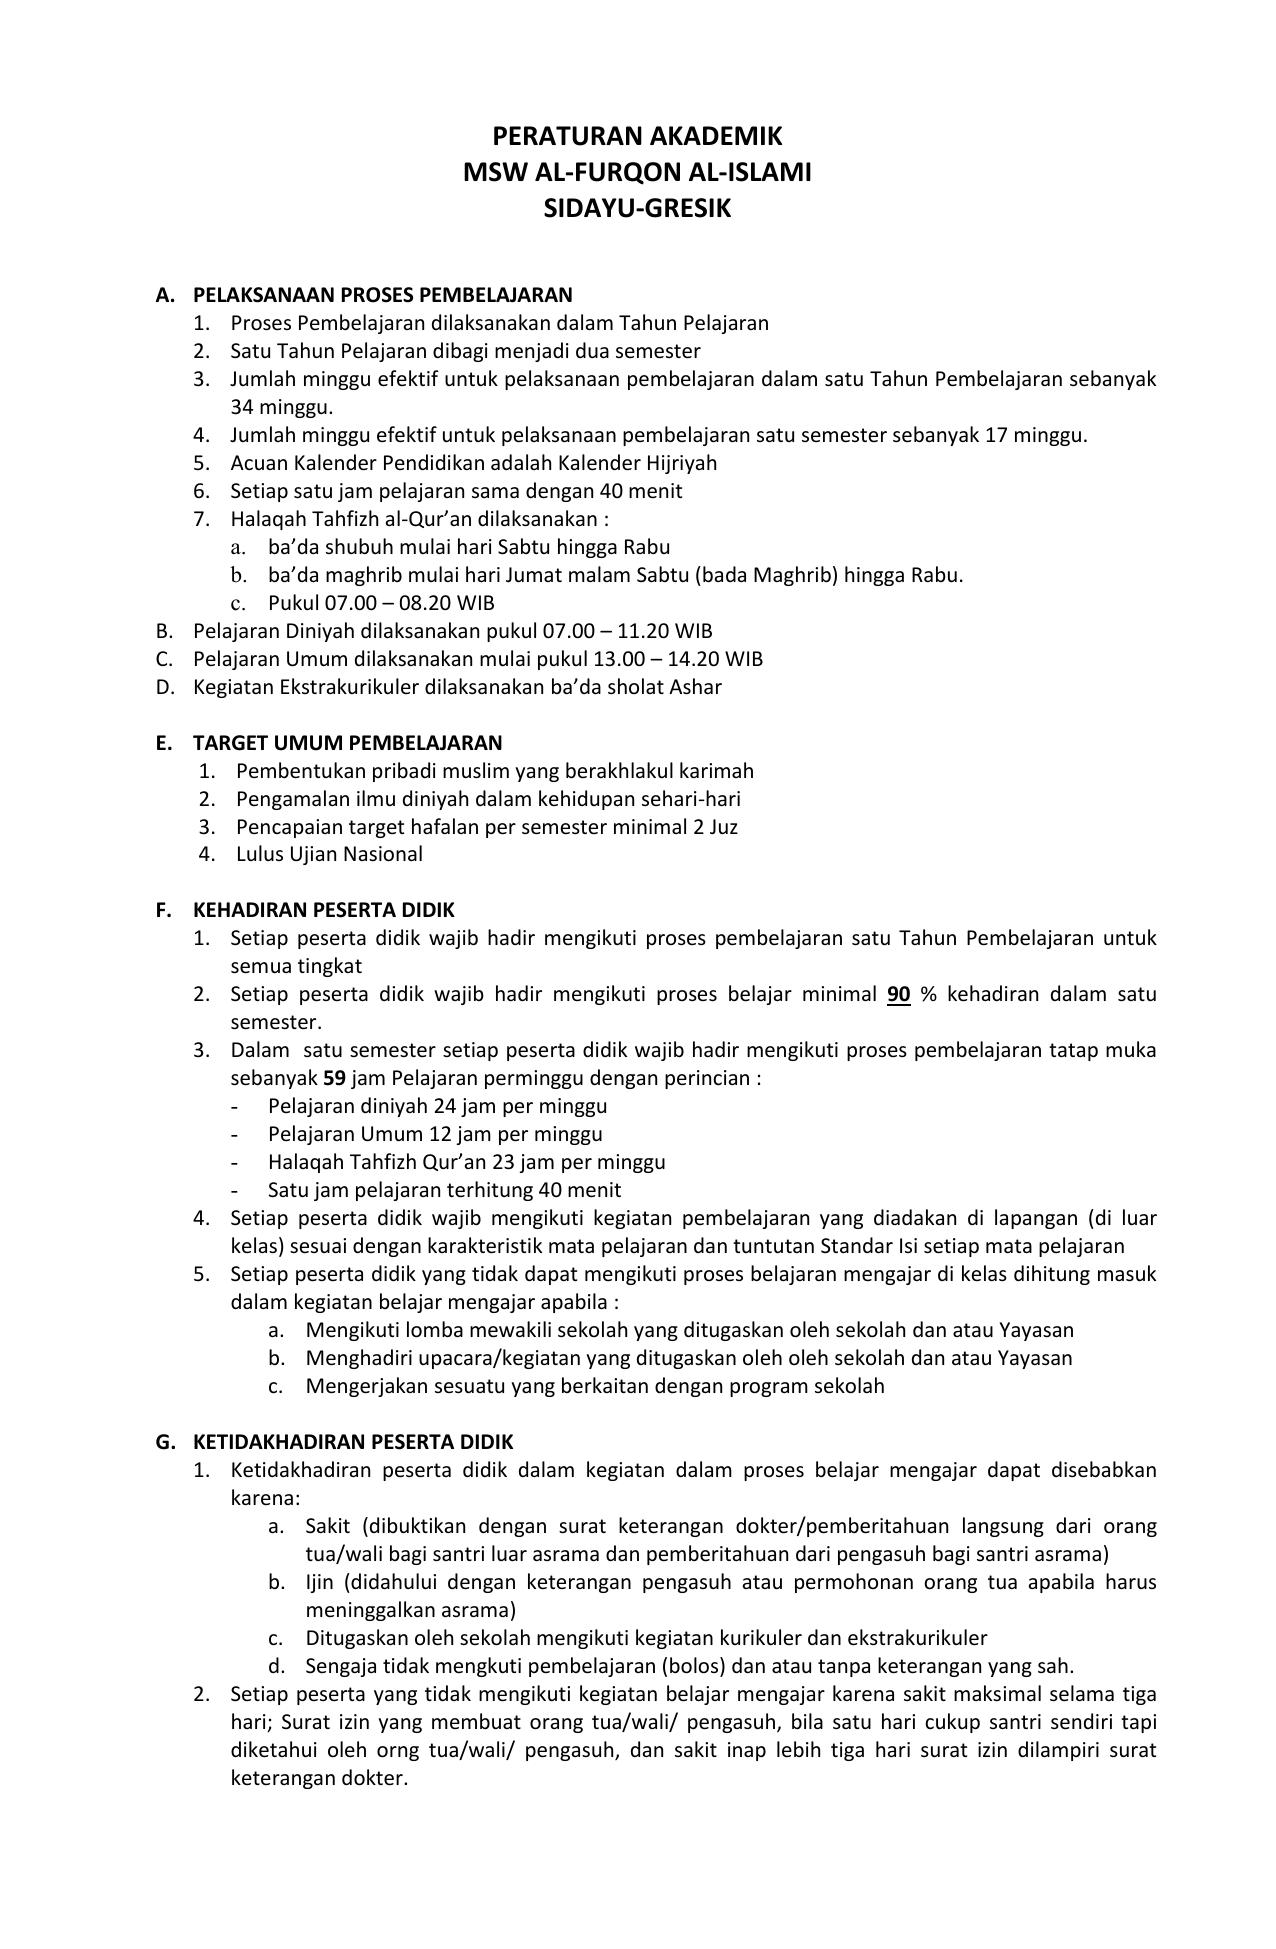 Contoh Surat Keterangan Lulus Sekolah Diniyah | Ini Surat